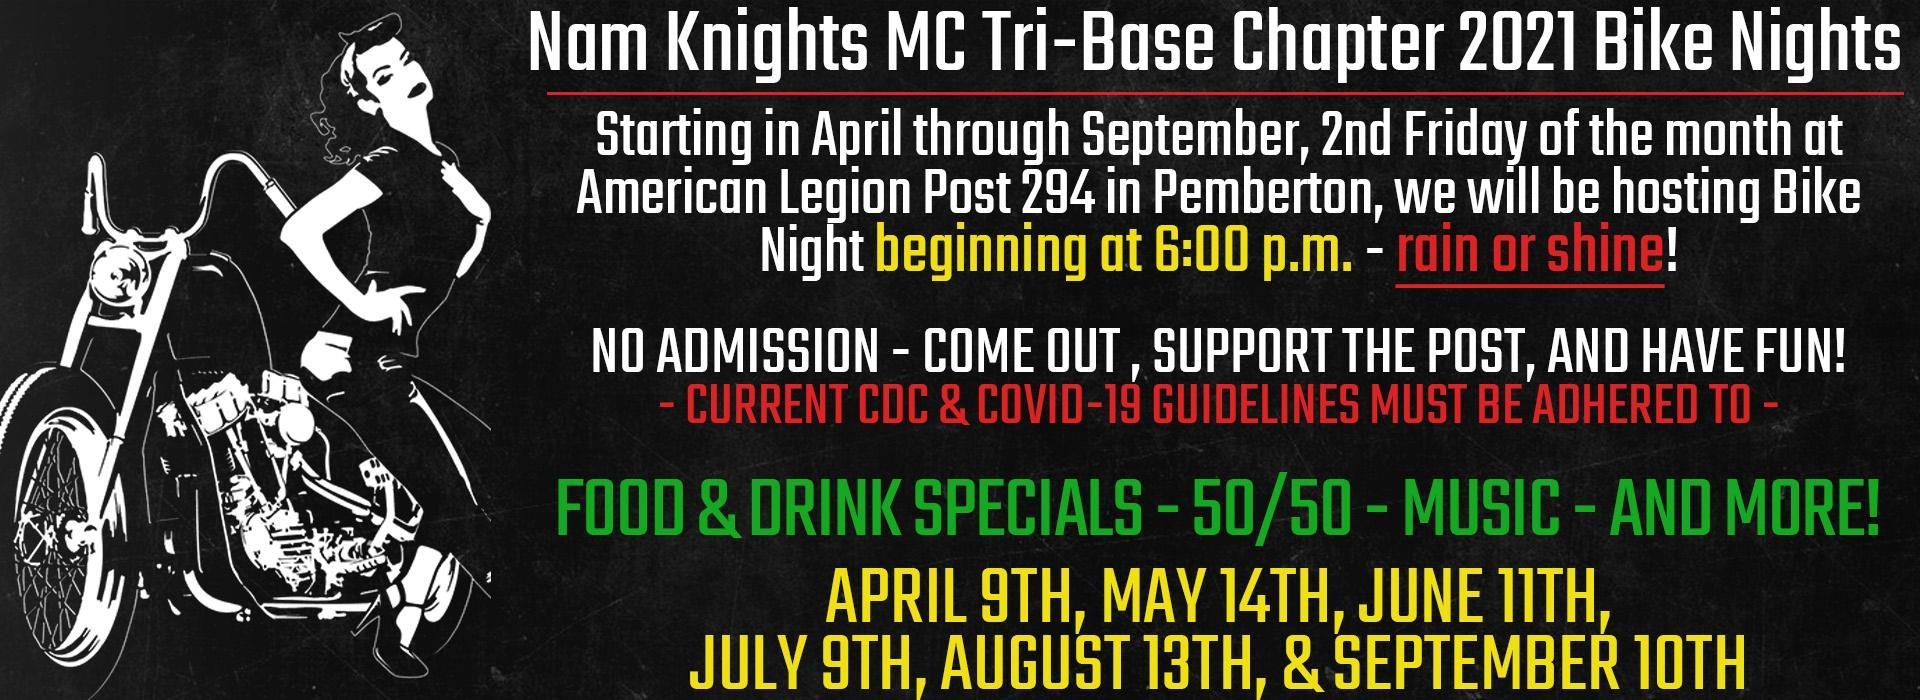 Nam Knights Tri Base Bike Knights - Nam Knights of America MC Club, Tri-Base Chapter Bike Night